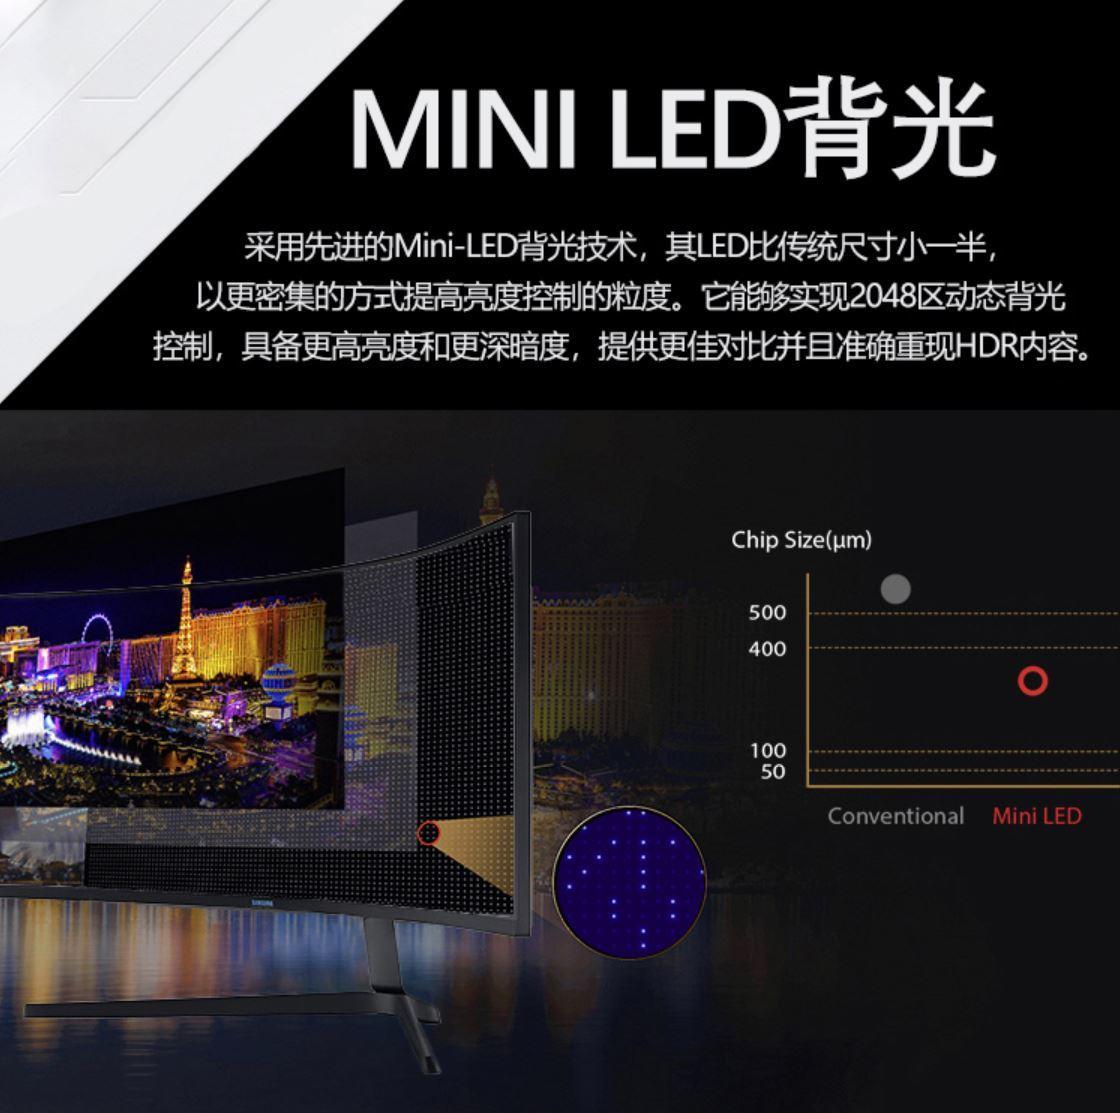 Samsung G9 2021 Miniled Marketing